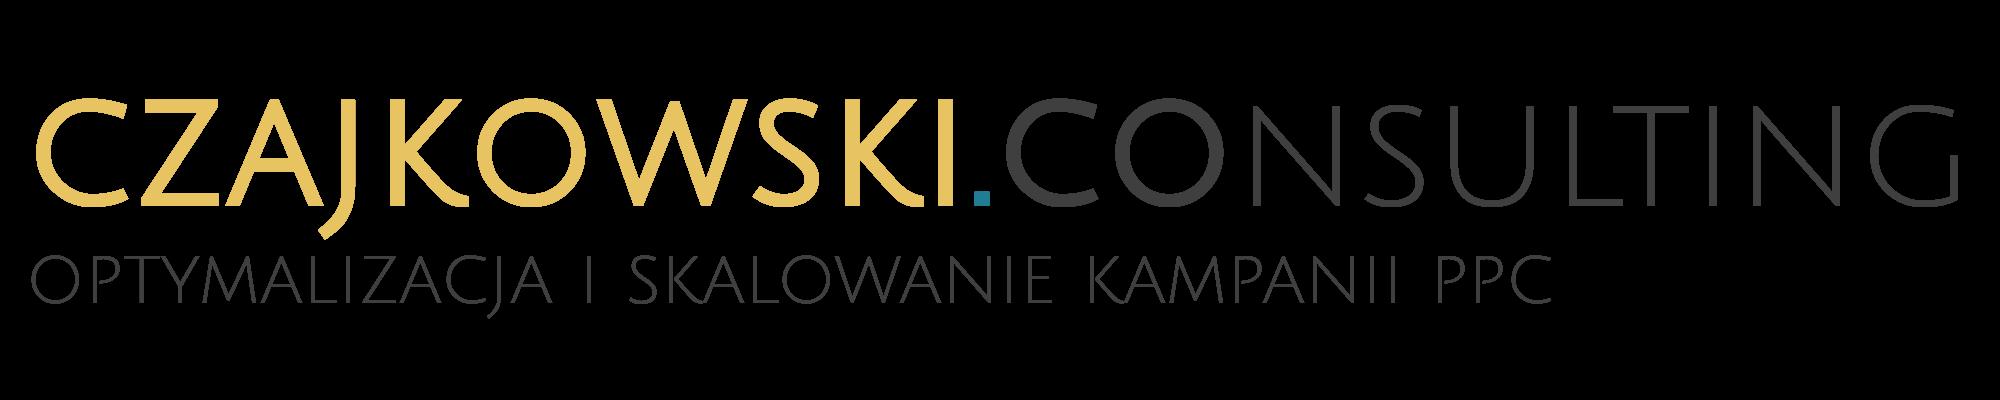 Czajkowski Consulting